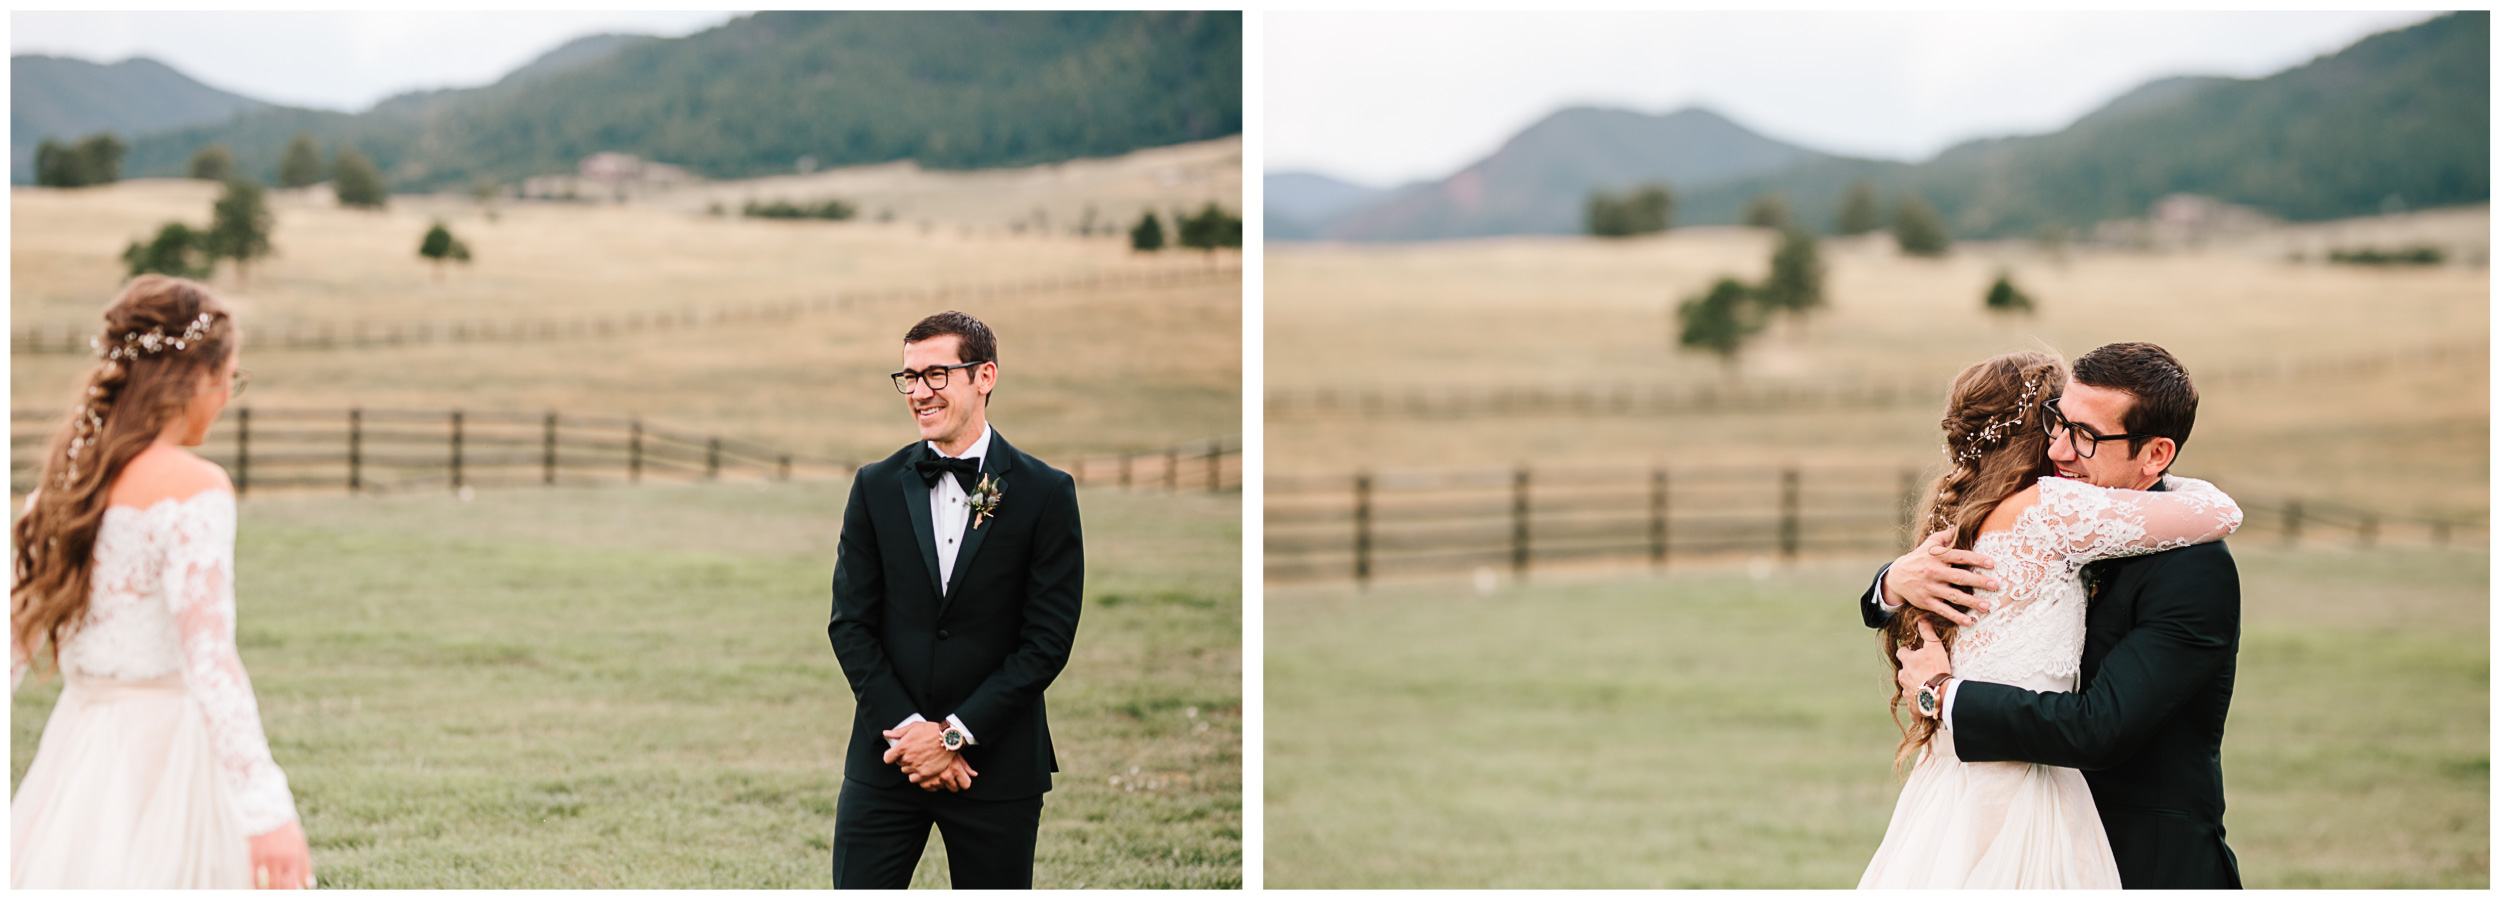 spruce_mountain_ranch_wedding_21.jpg